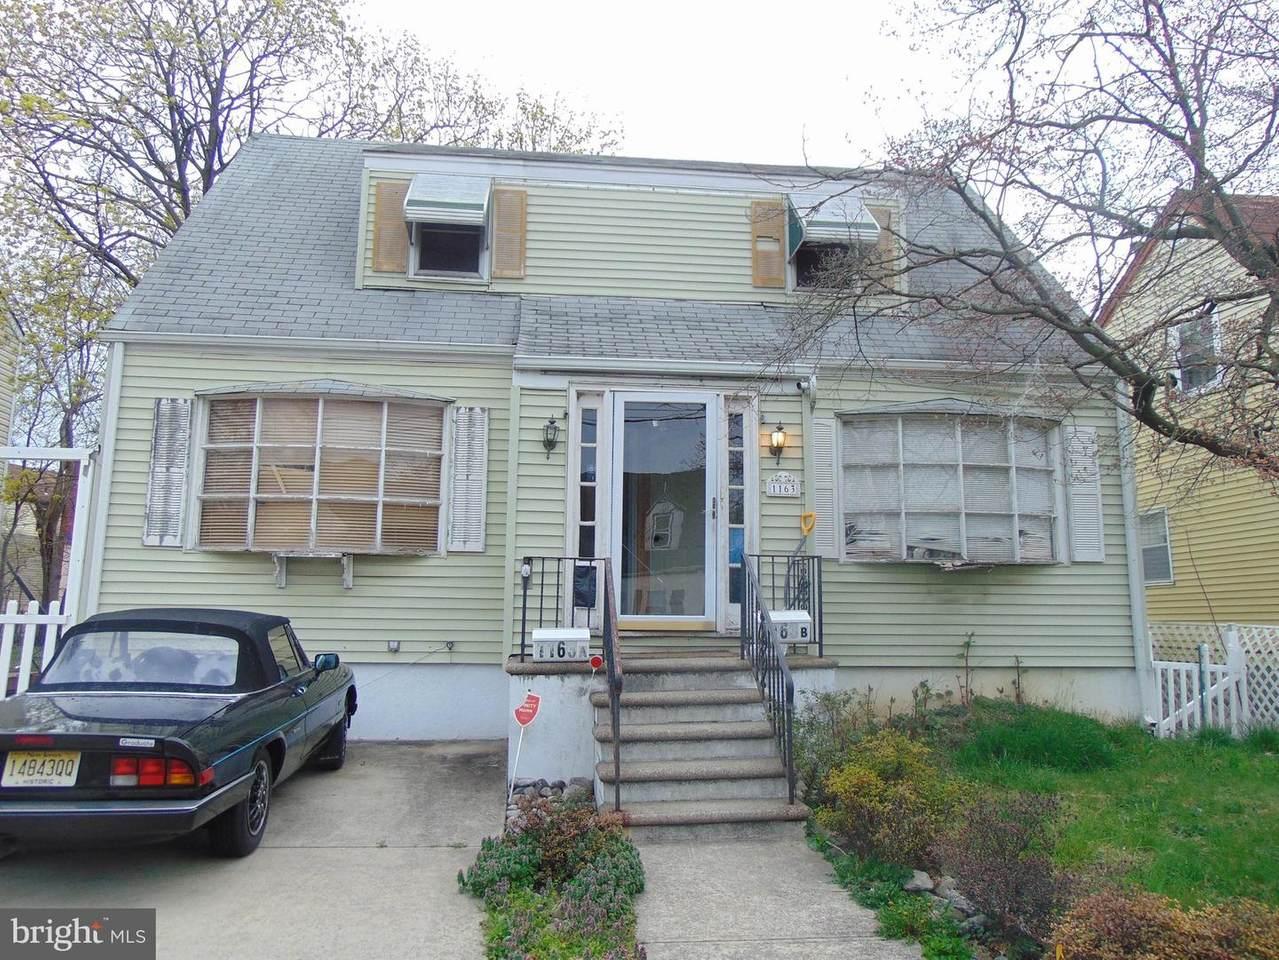 1163 Lucille Avenue - Photo 1